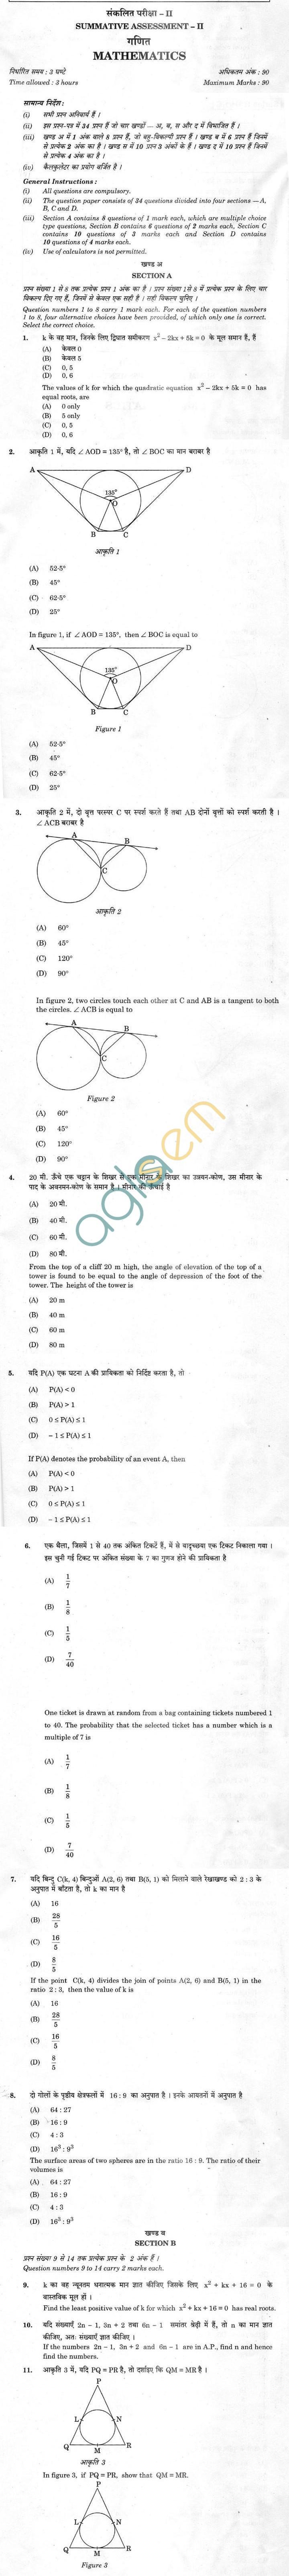 CBSE Board Exam Class 10 SA2 Sample Question Paper –Mathematics